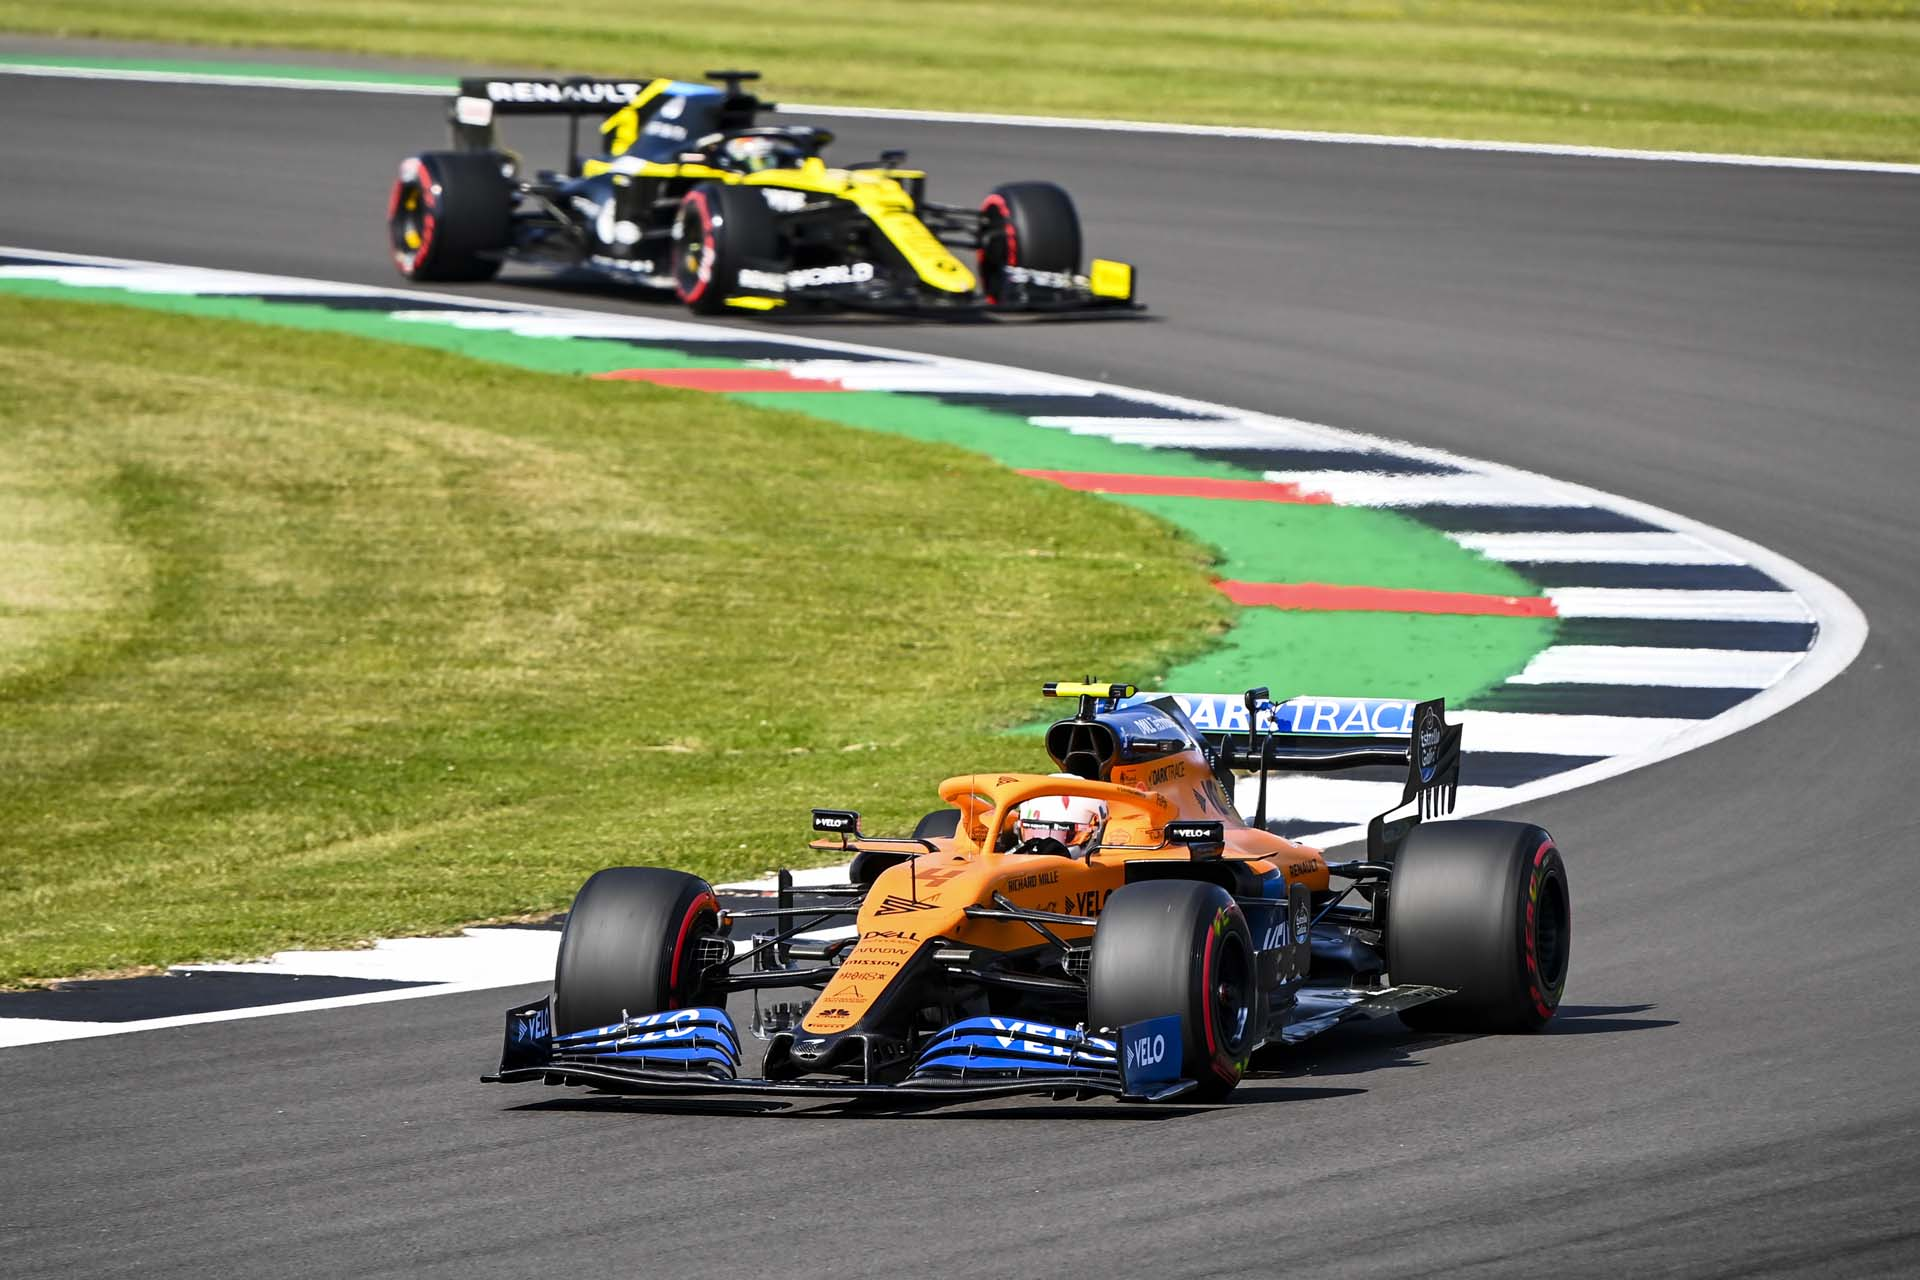 Lando Norris, McLaren MCL35, leads Daniel Ricciardo, Renault R.S.20